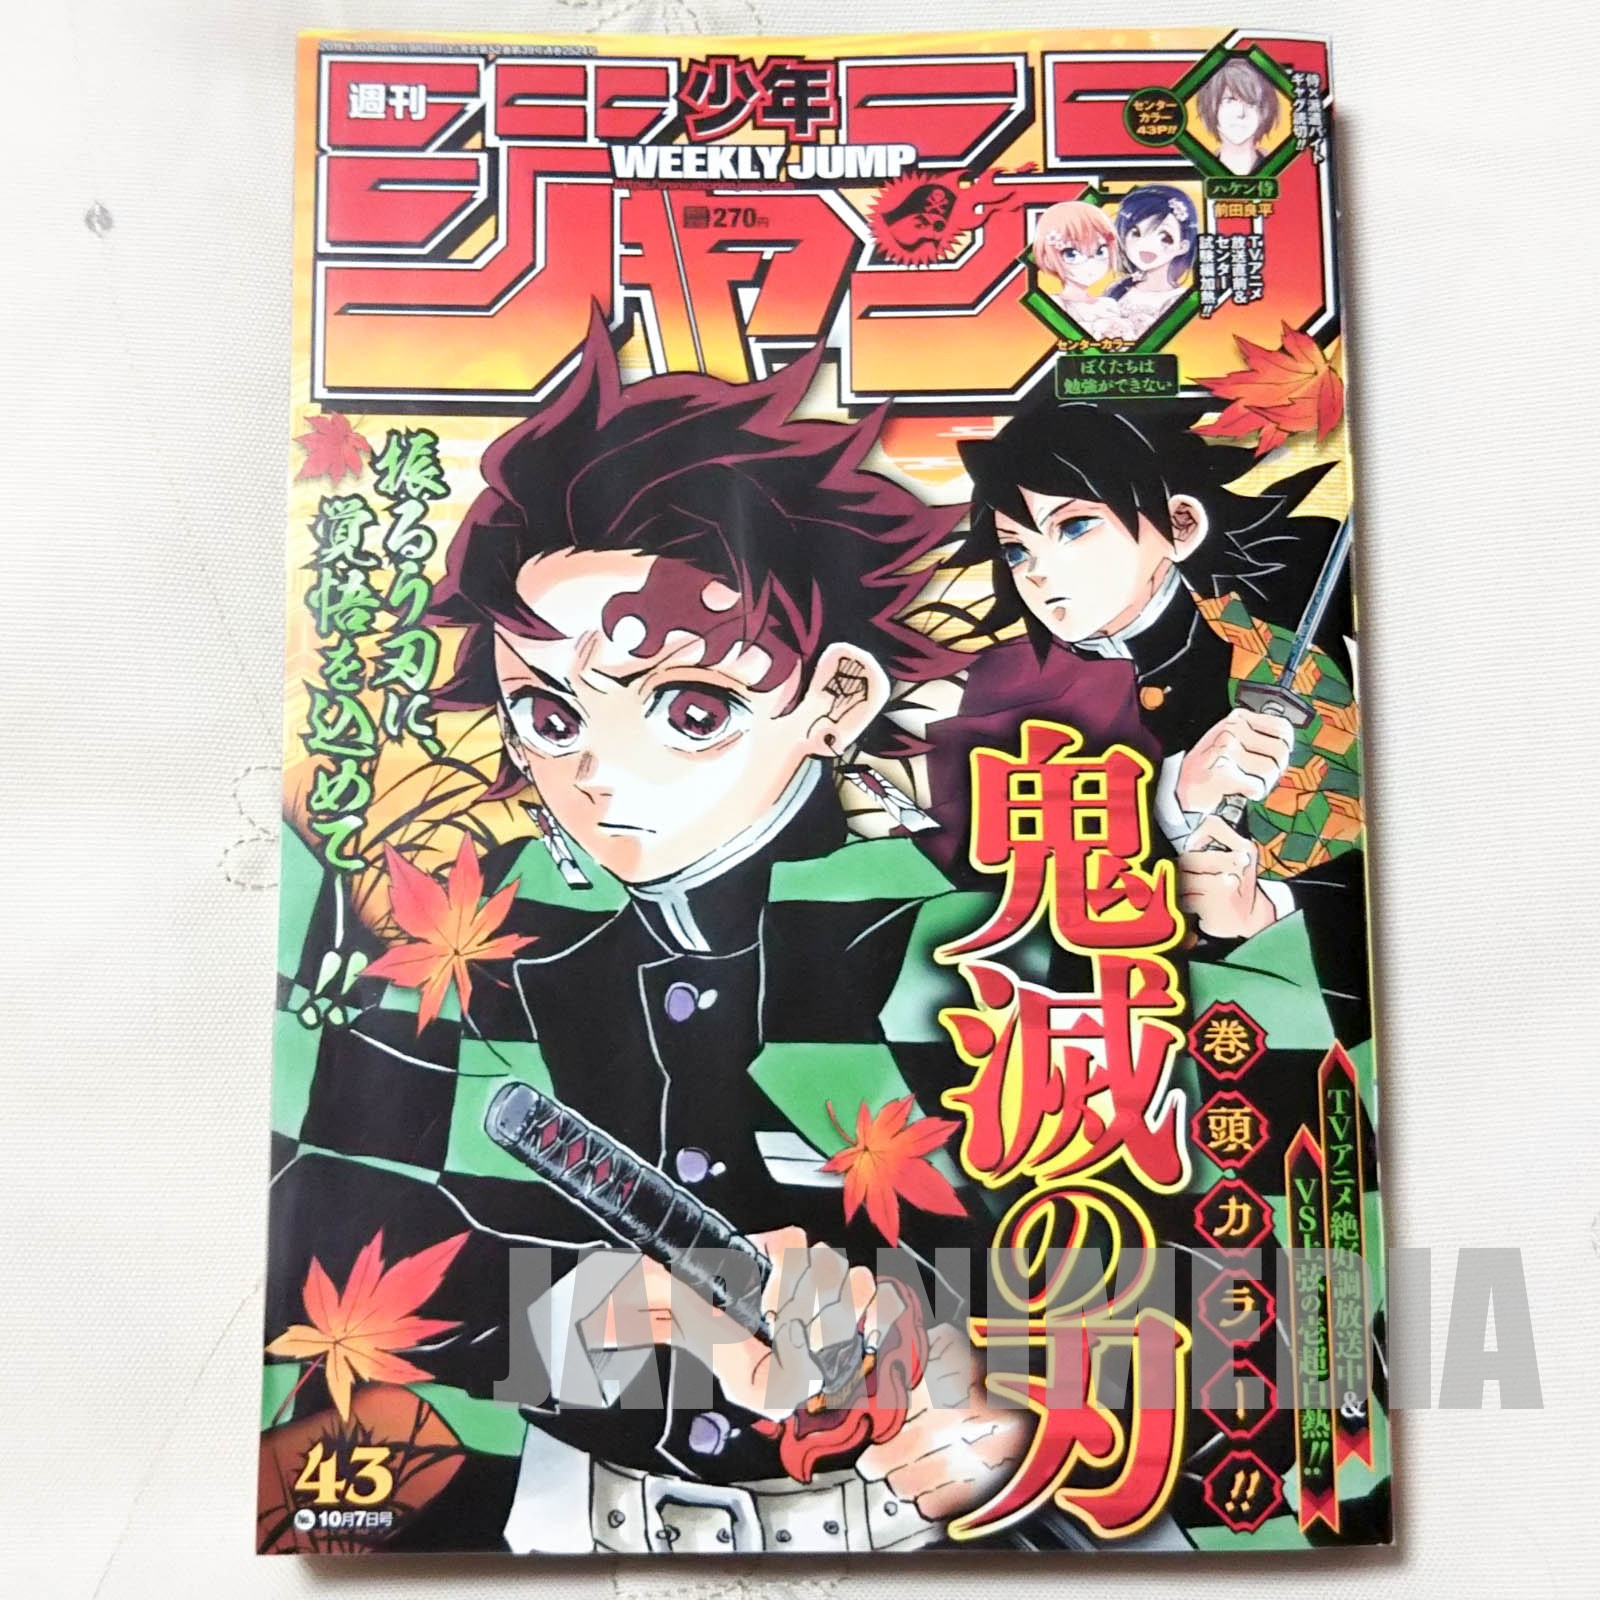 Weekly Shonen JUMP Vol.43 2019 Demon Slayer : Kimetsu no Yaiba / Japanese Magazine JAPAN MANGA